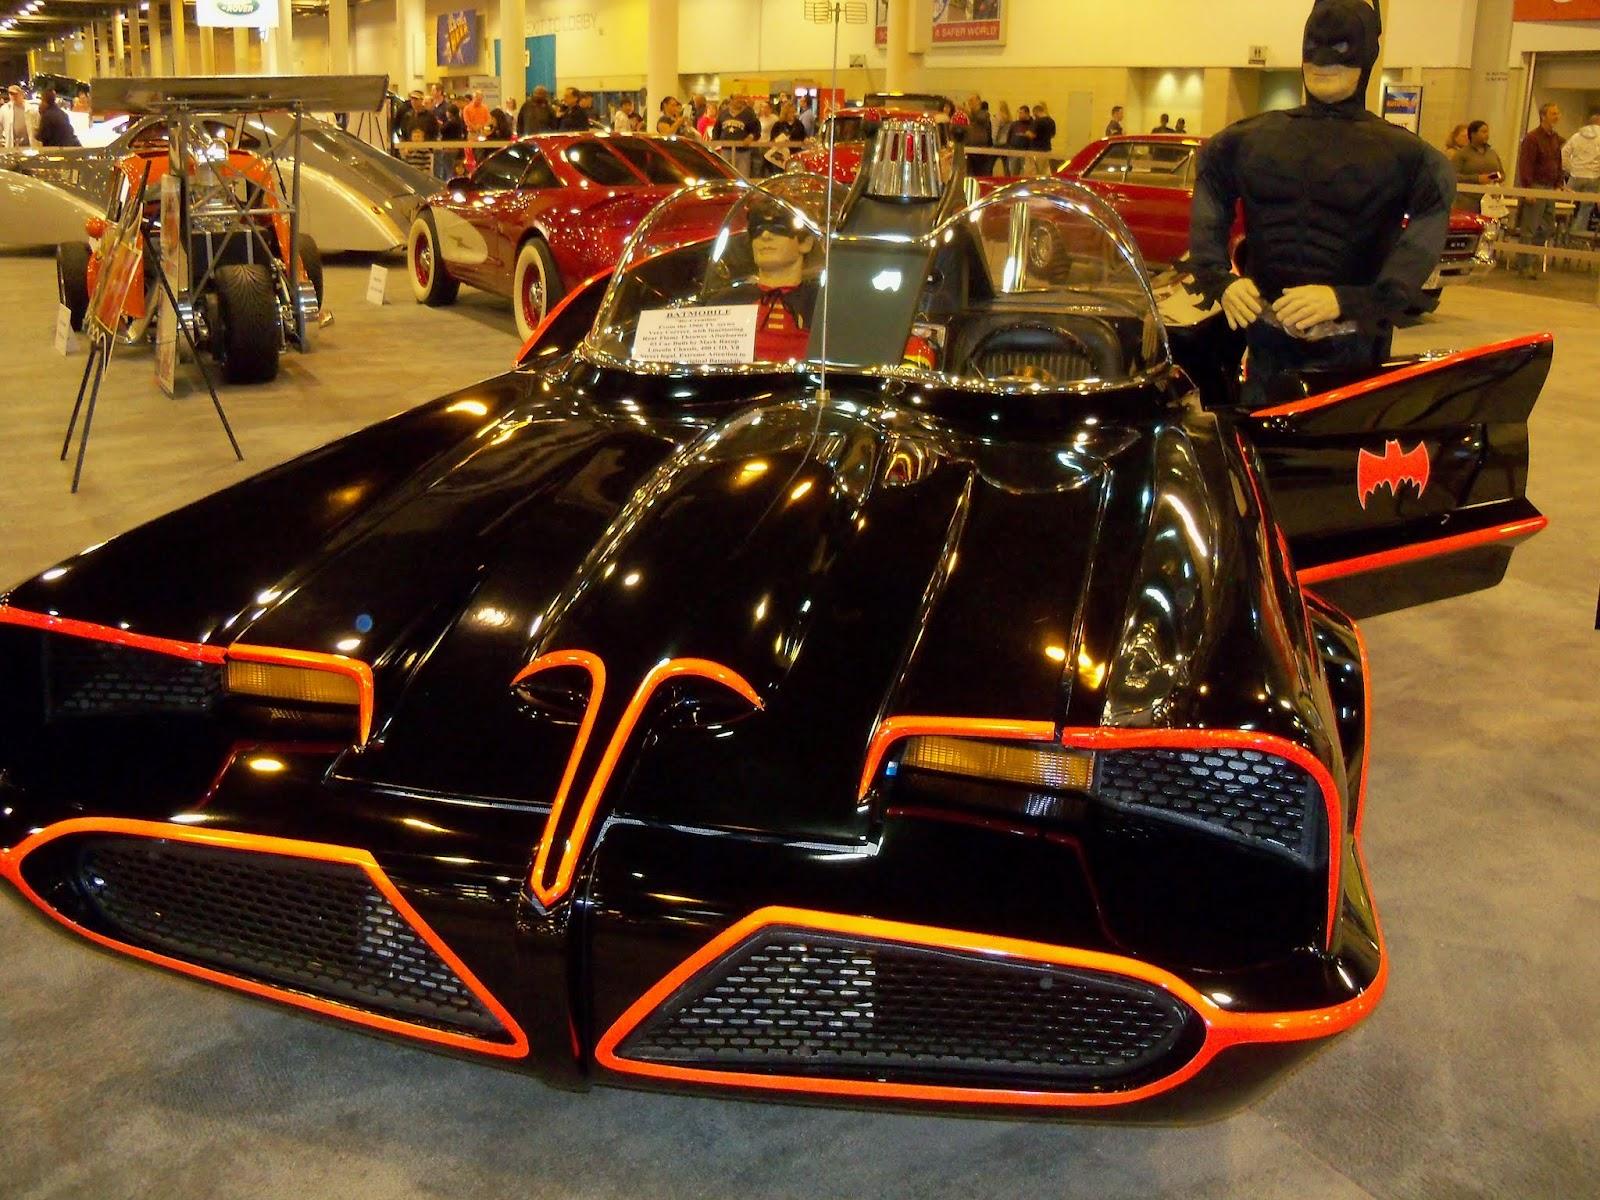 Houston Auto Show 2015 - 116_7246.JPG